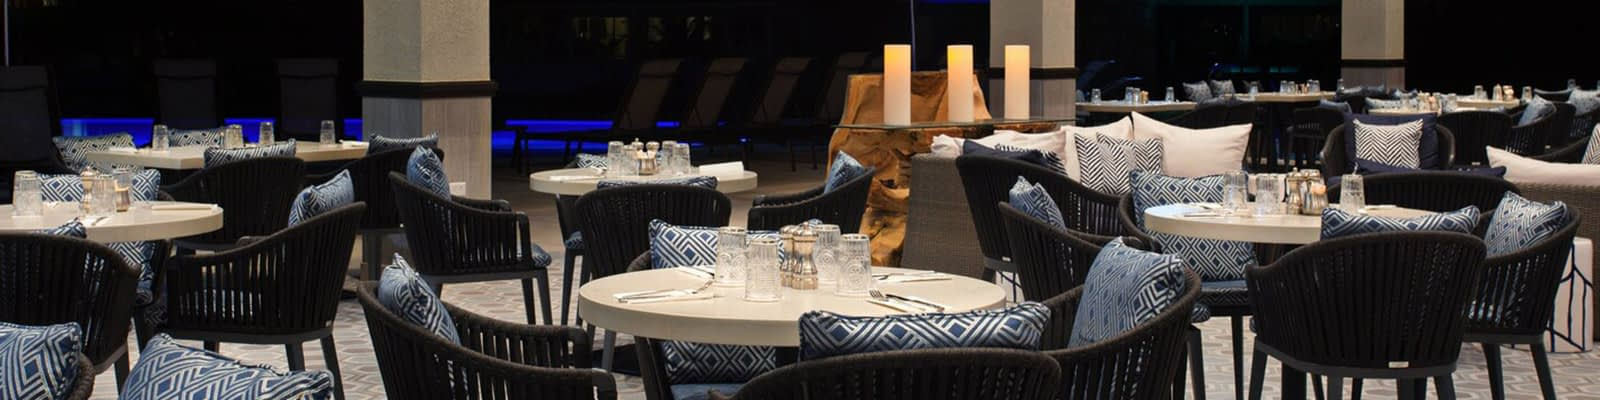 cy-by-marriott-bonaire-restaurant-slider-image-5